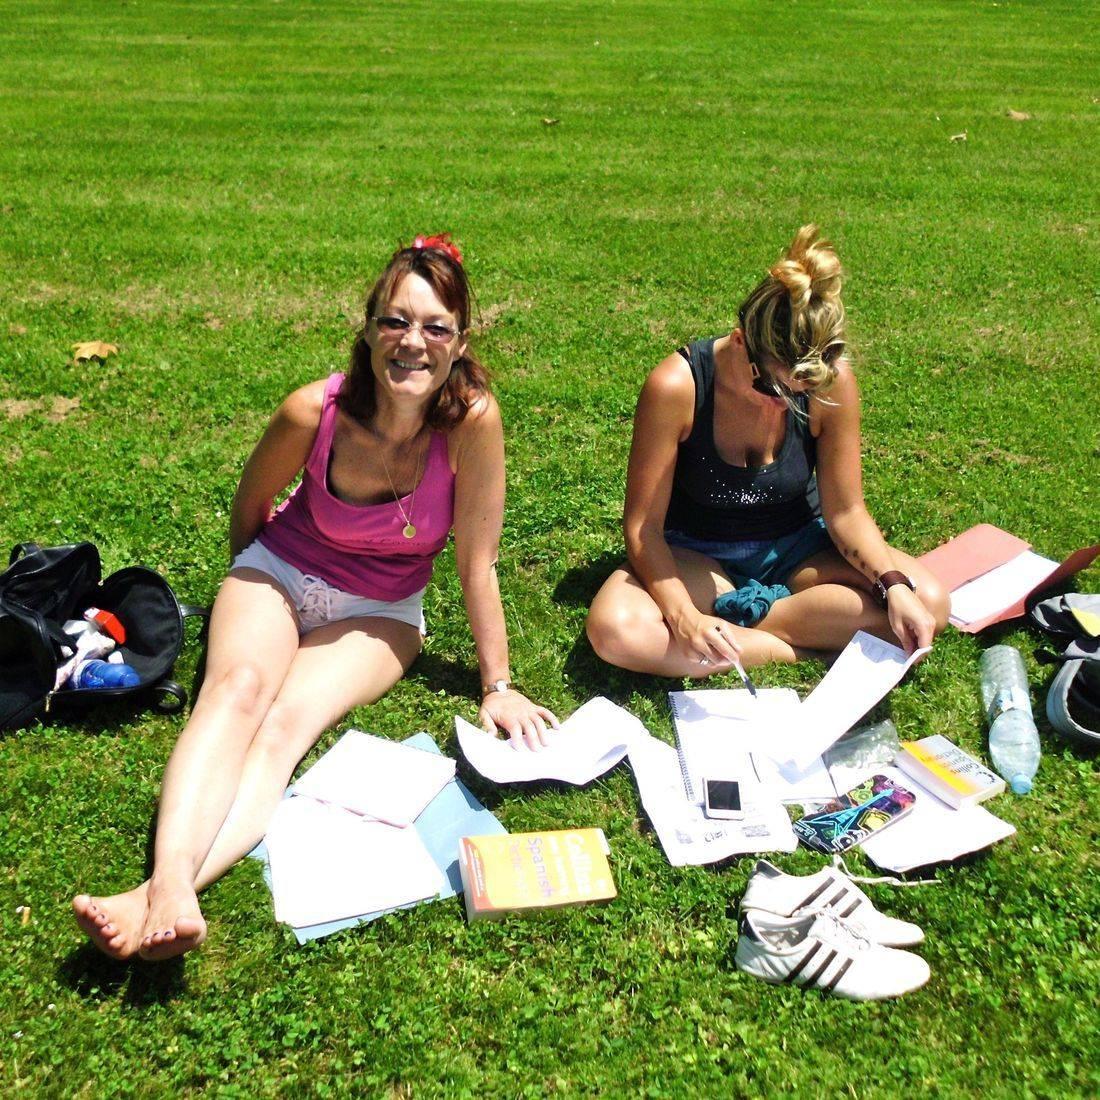 Students preparing for language degrees